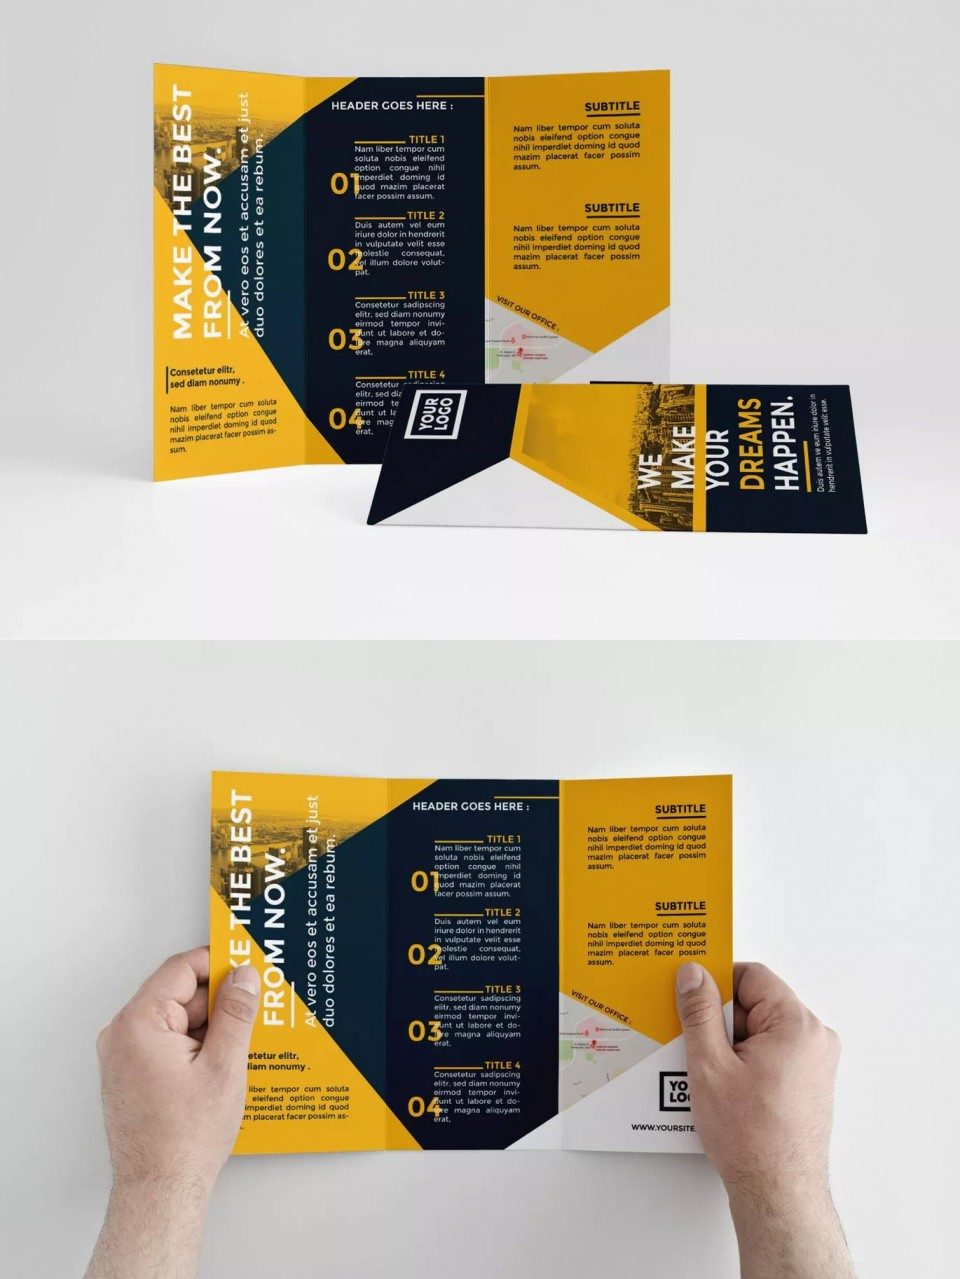 000 Shocking Indesign Trifold Brochure Template Inspiration  Tri Fold A4 Bi Free Download960